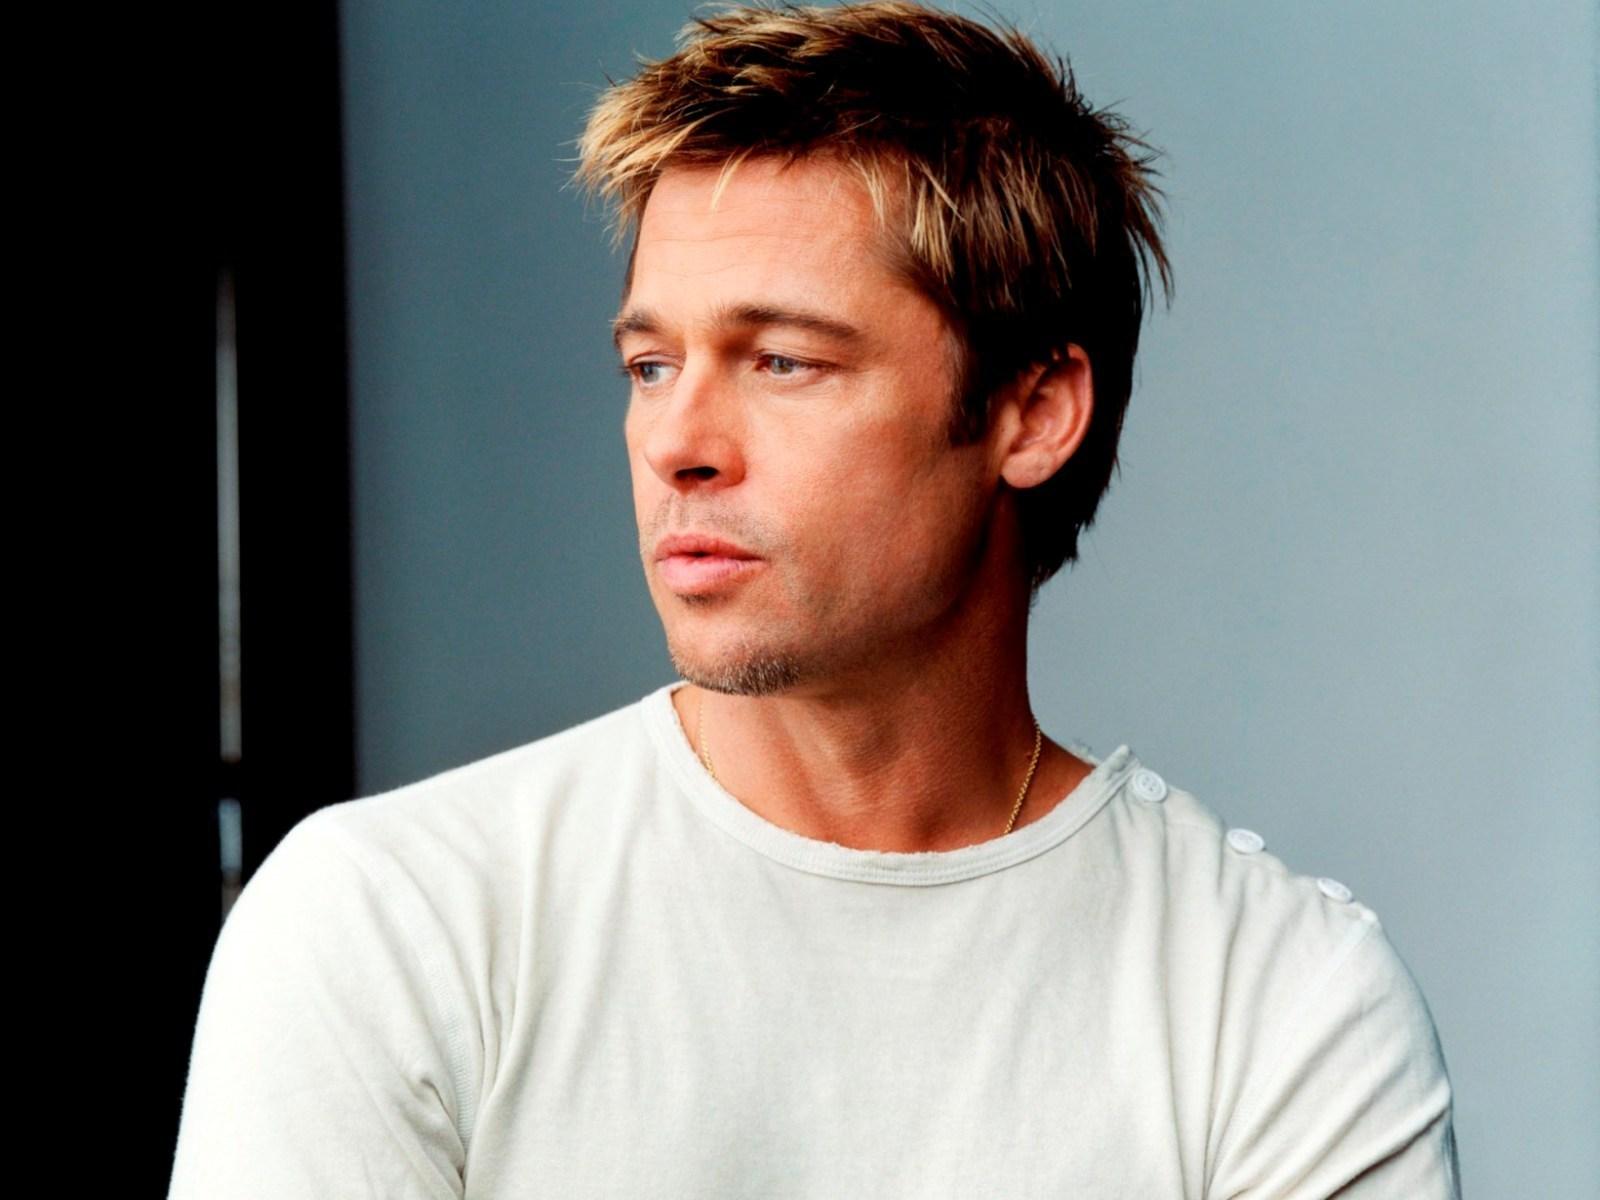 pitt   Brad Pitt Wallpaper 10613848 1600x1200